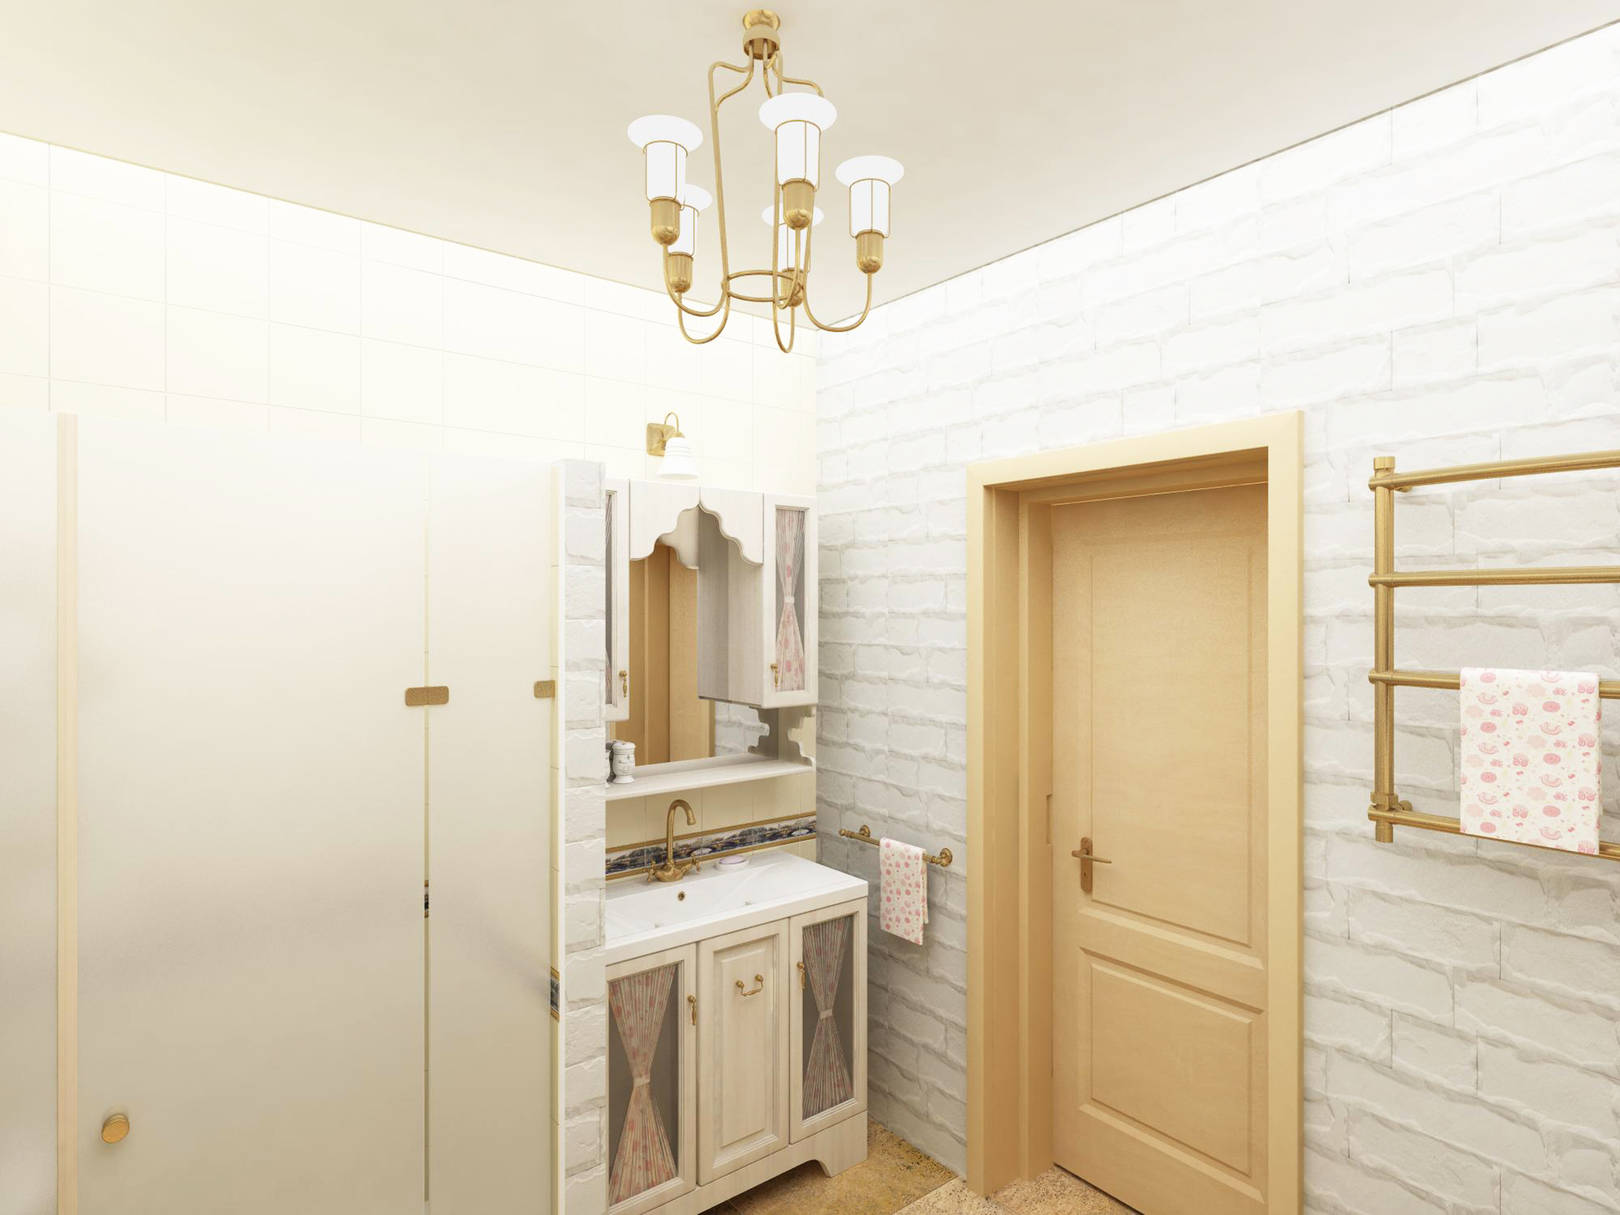 Романтическая ванная комната